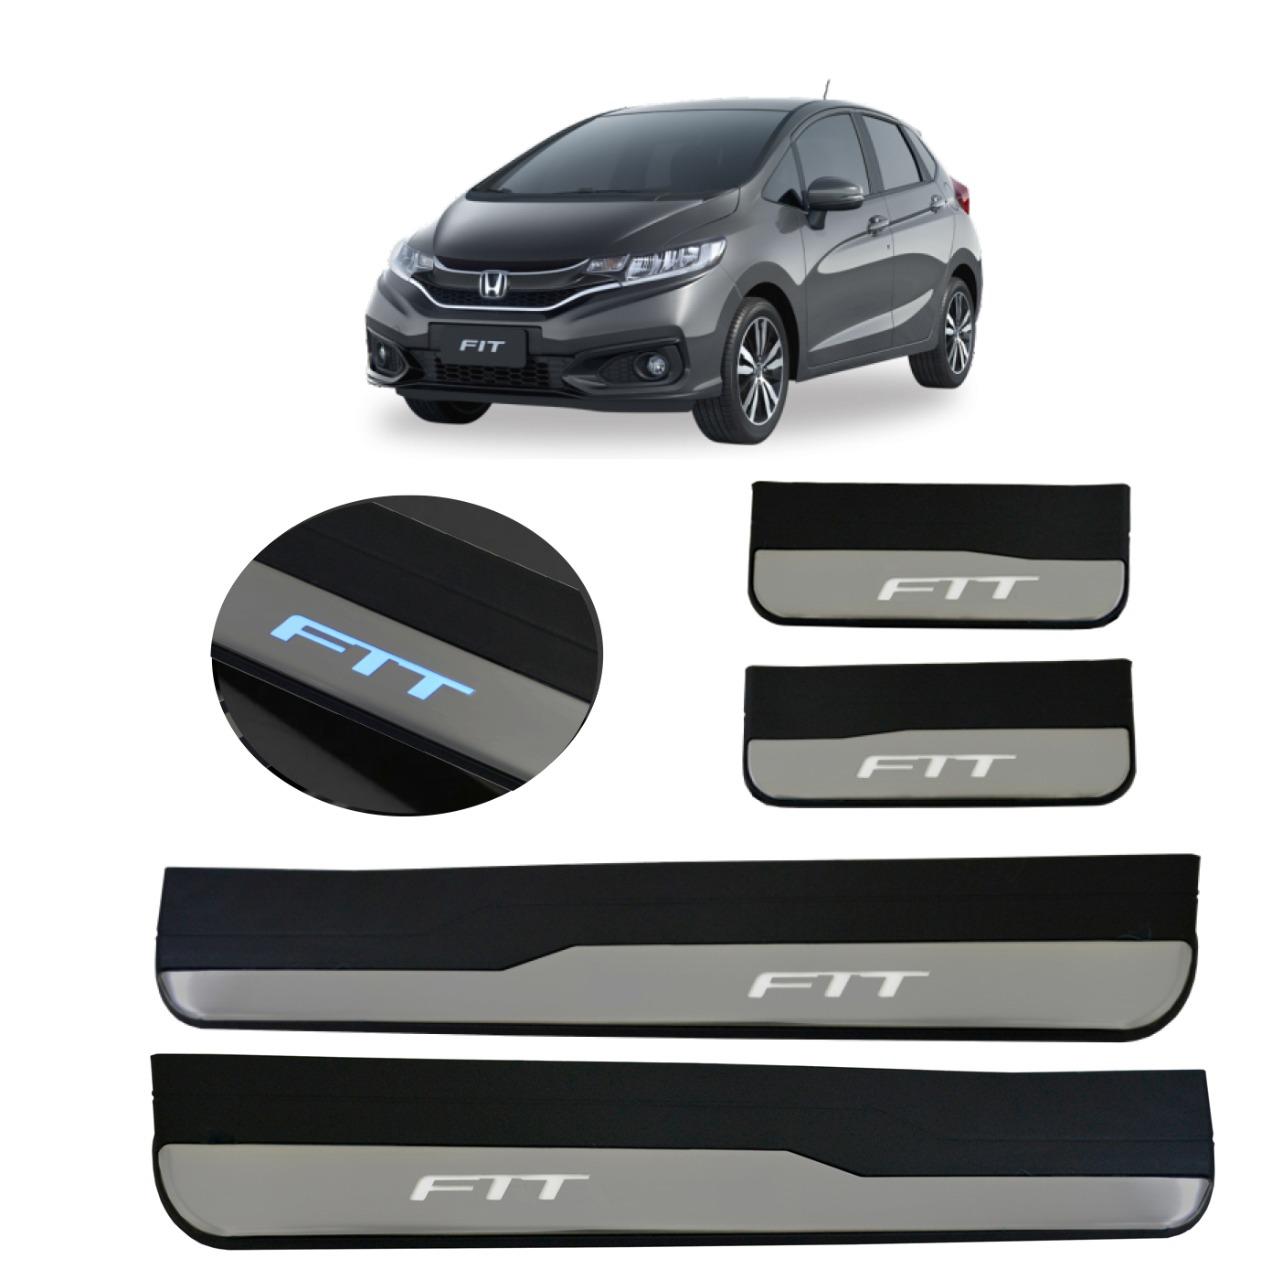 Kit Soleira de Porta C/ LED Honda FIT Inox Iluminada SLA872